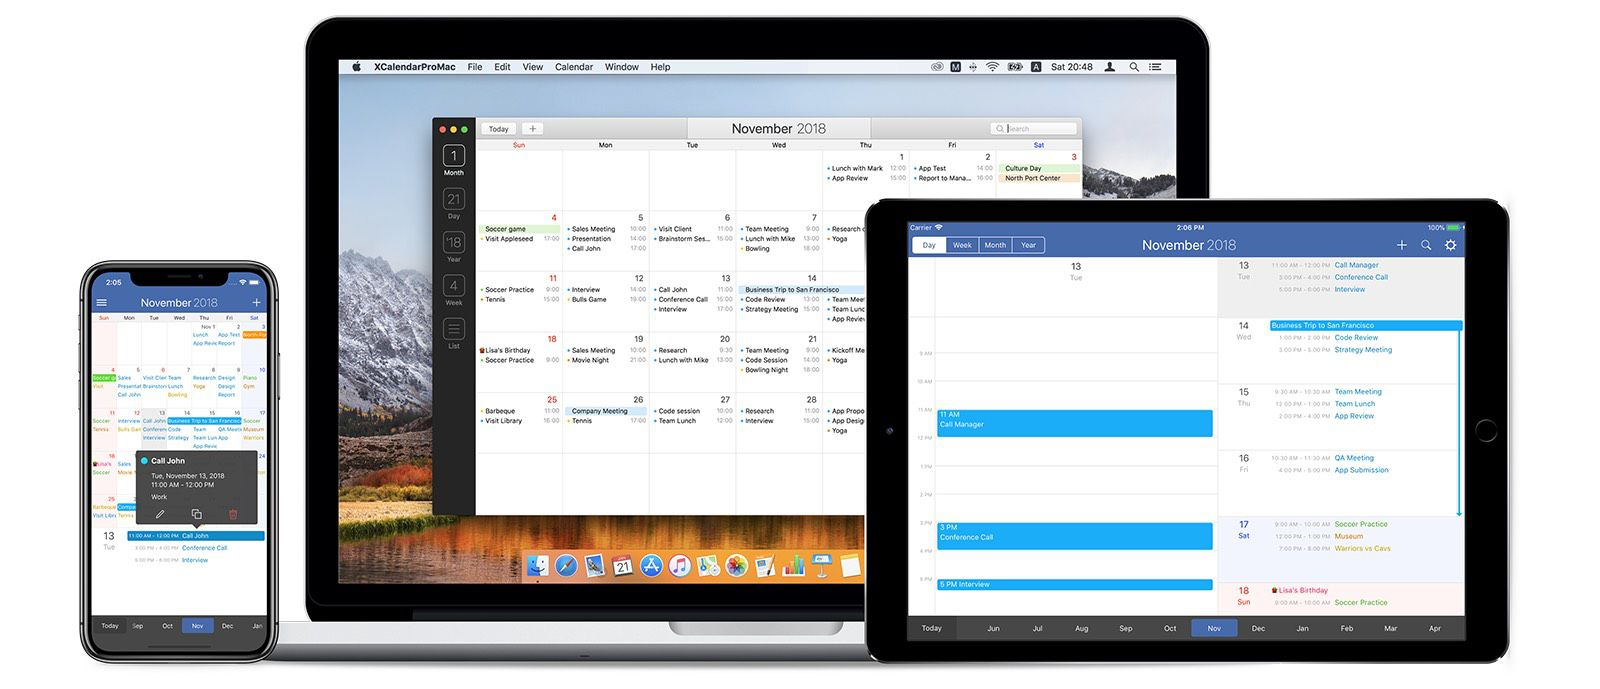 FirstSeed Calendar: Free calendar for iPhone - BrettTerpstra com